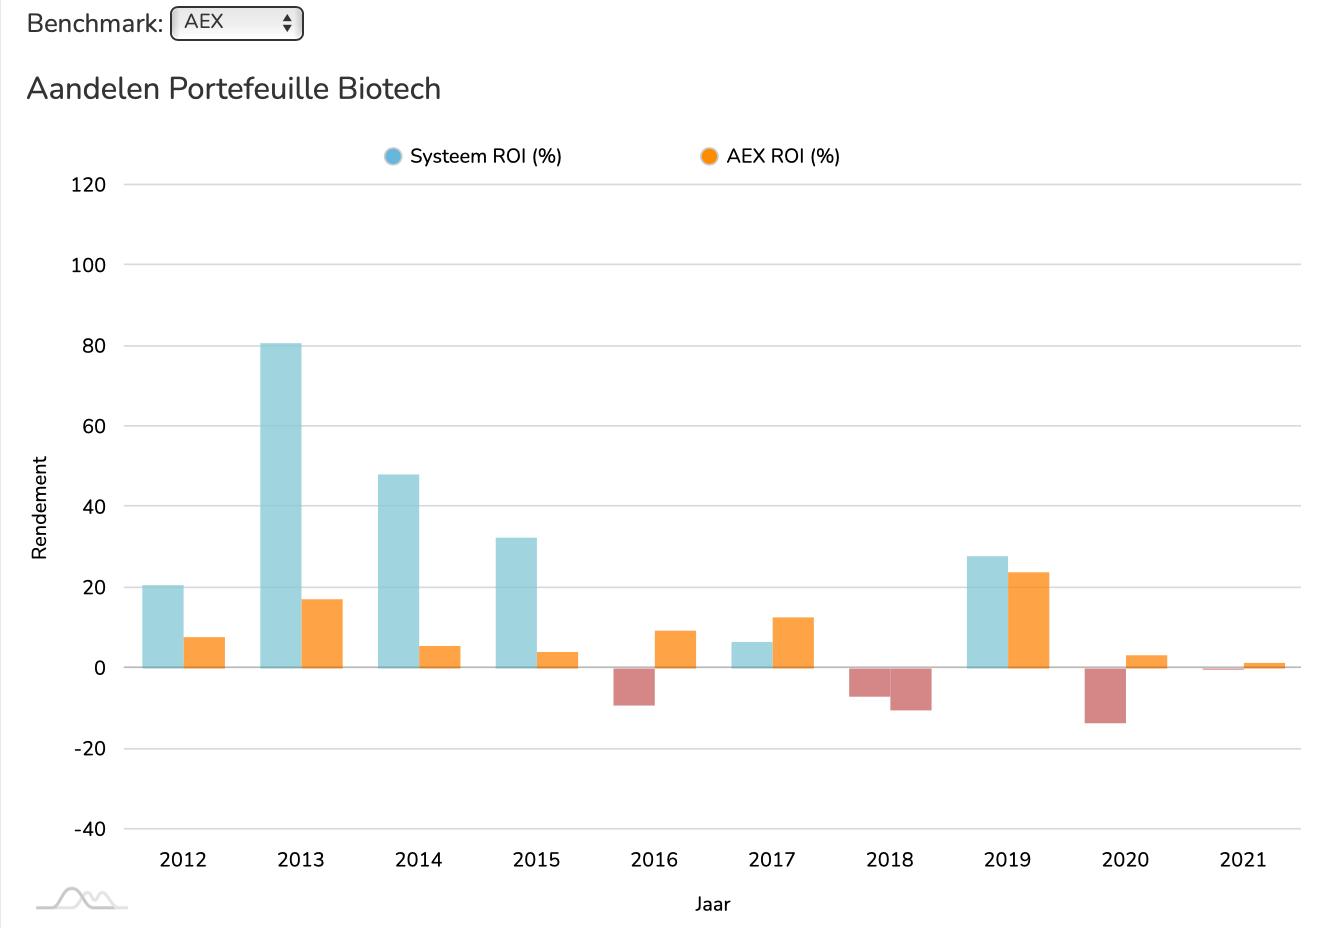 Aandelen Biotech ROI vs AEX